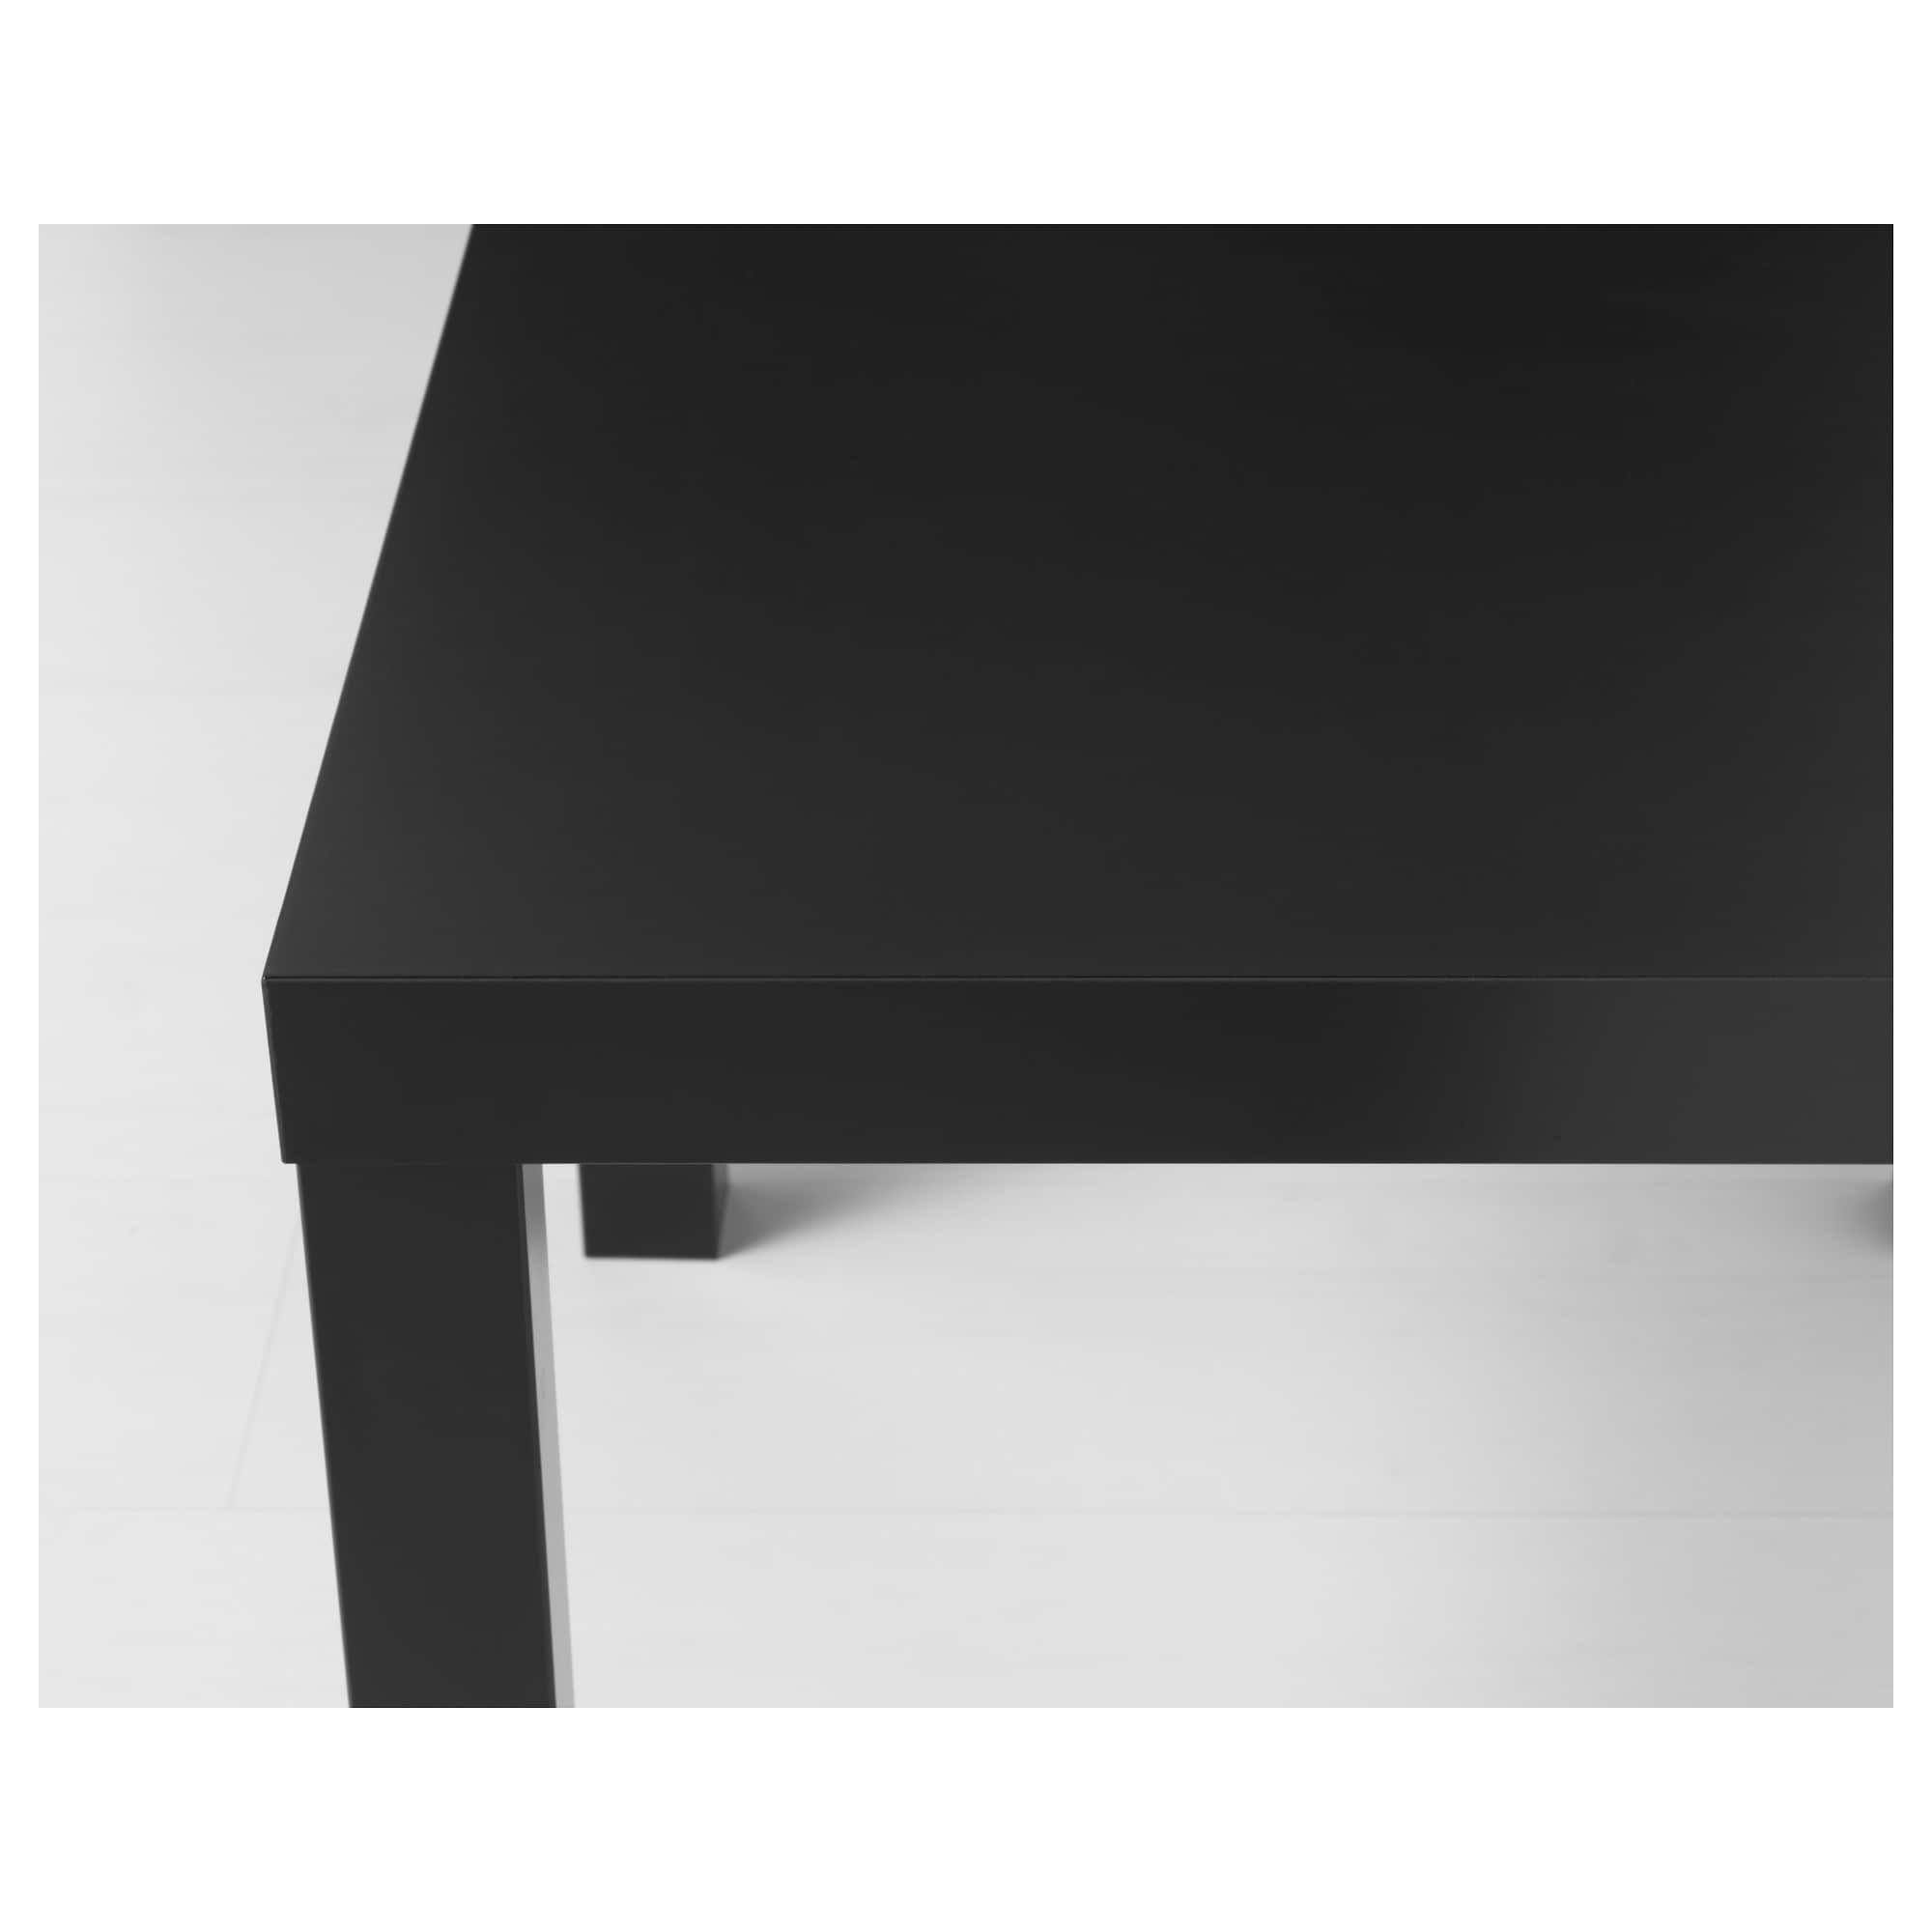 Ikea lack black side table ikea lack side table ikea